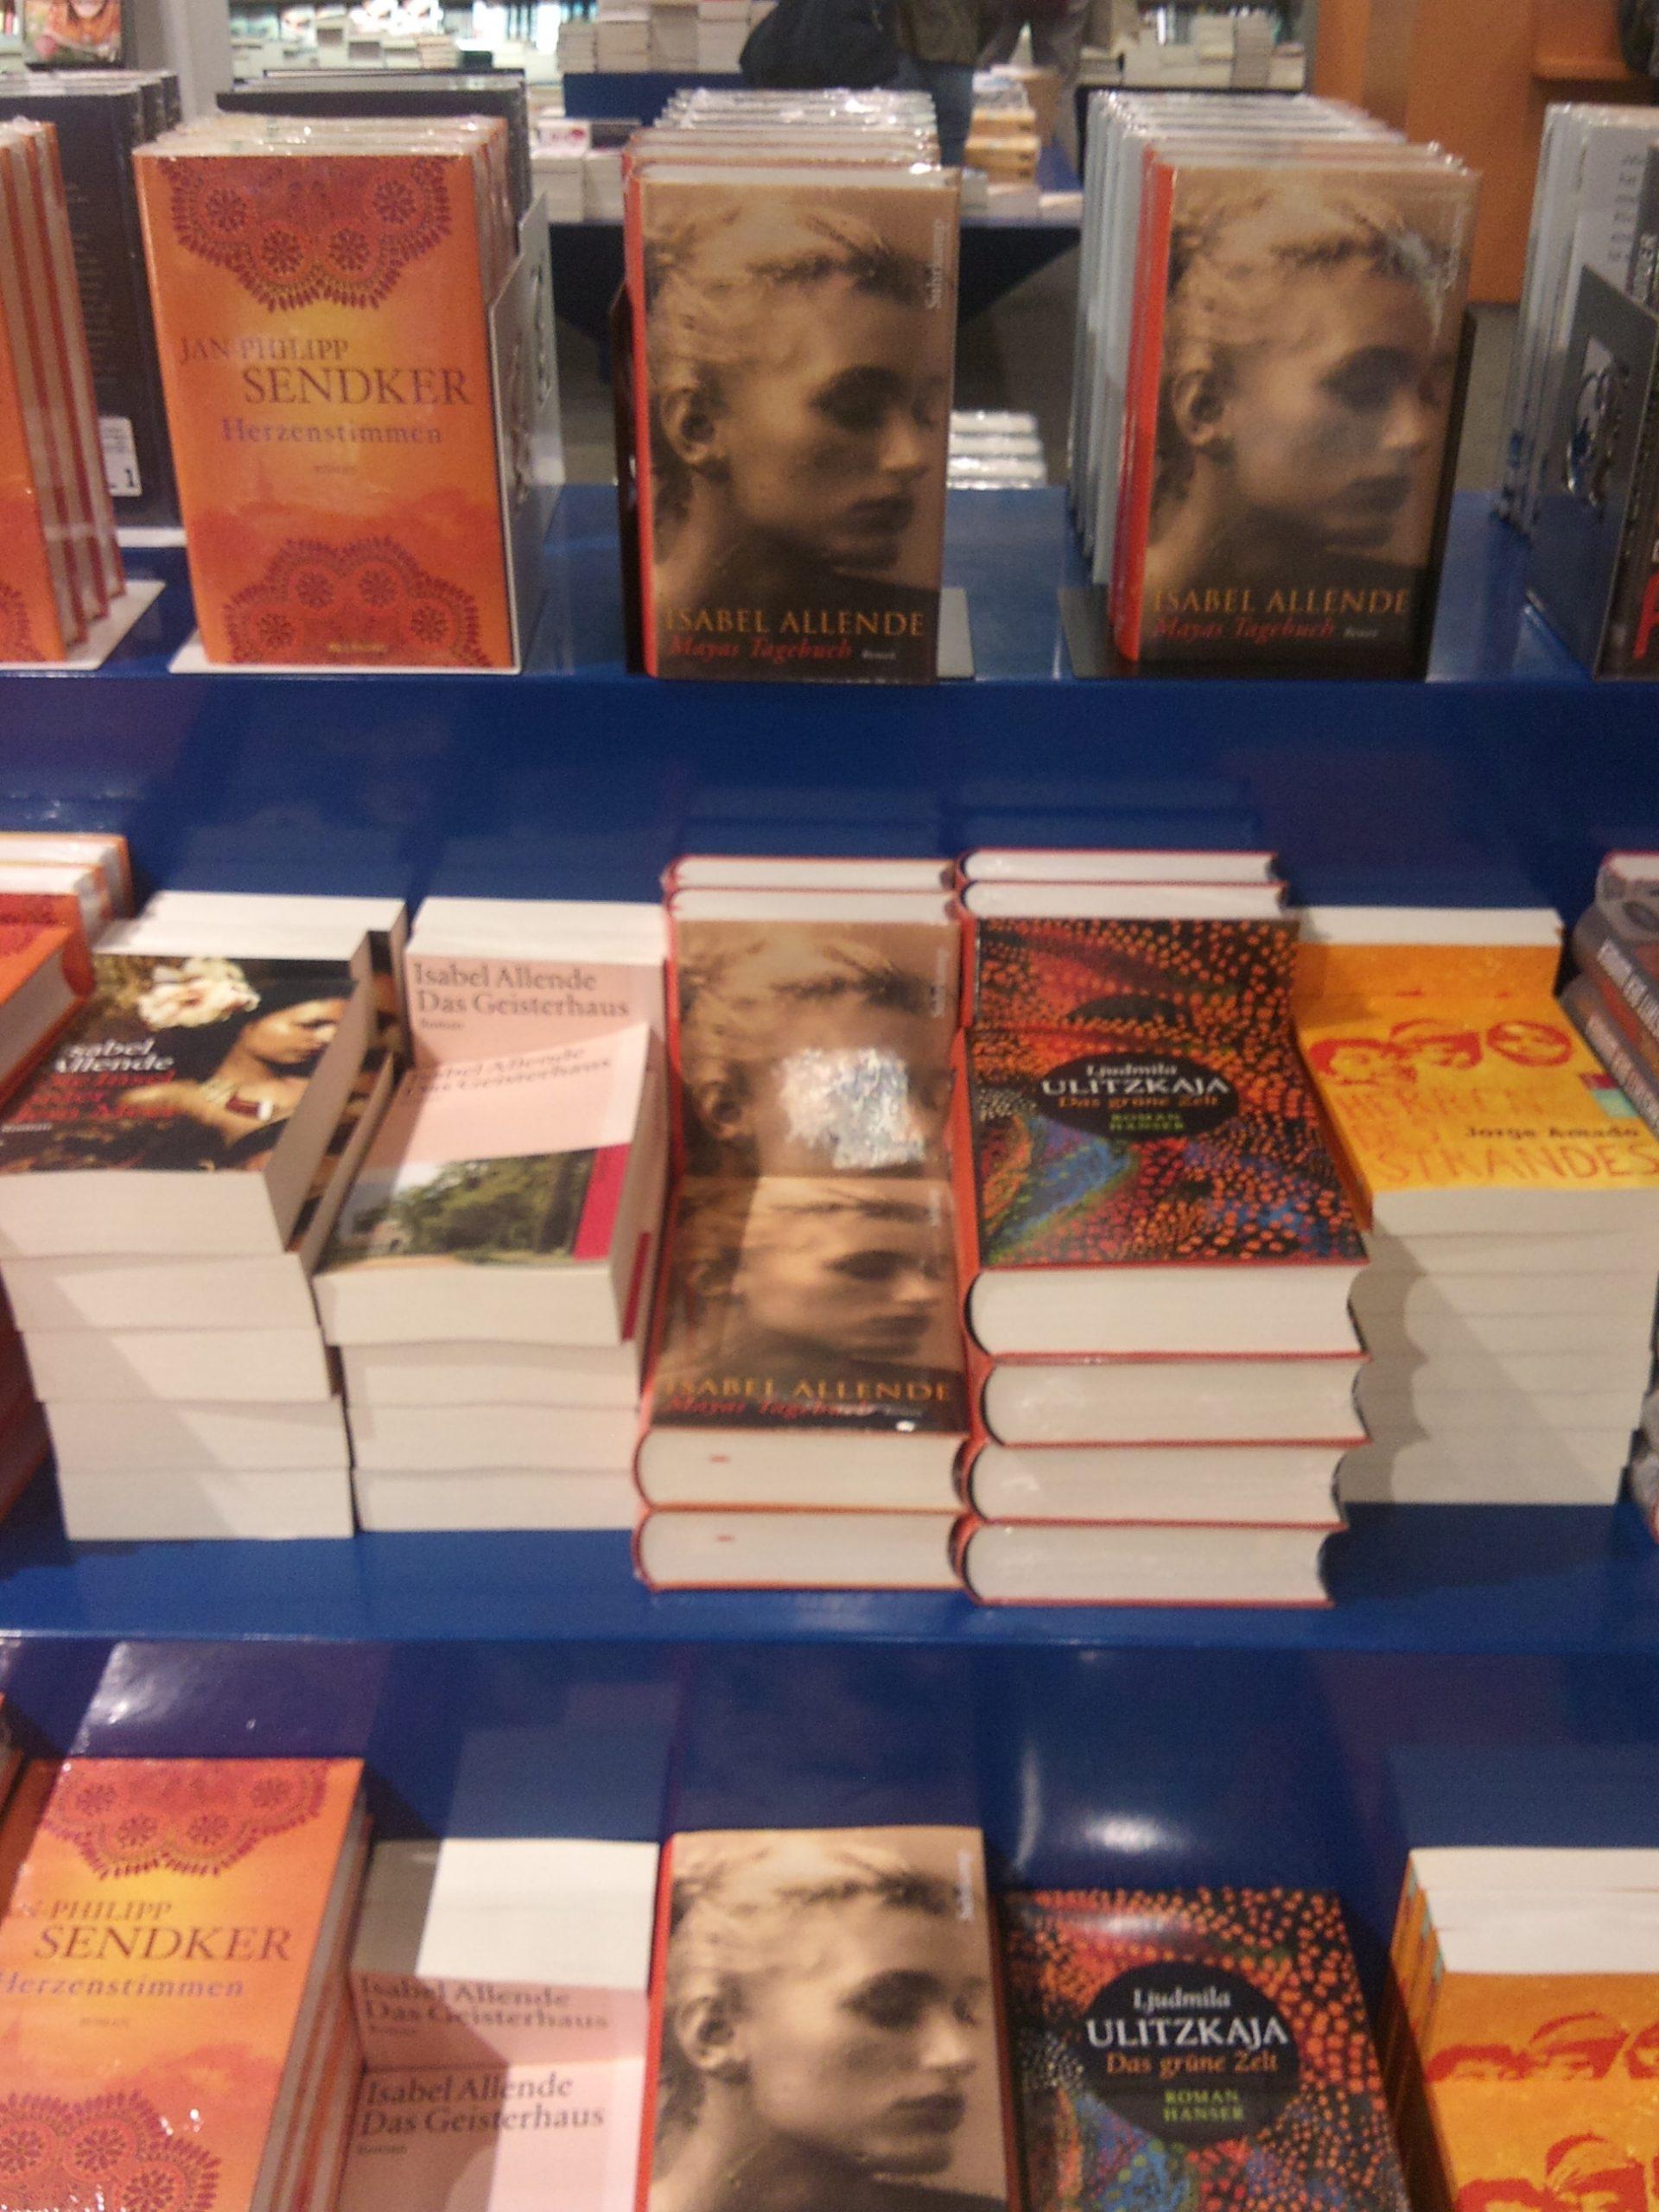 vender un libro: estrategia tradicional